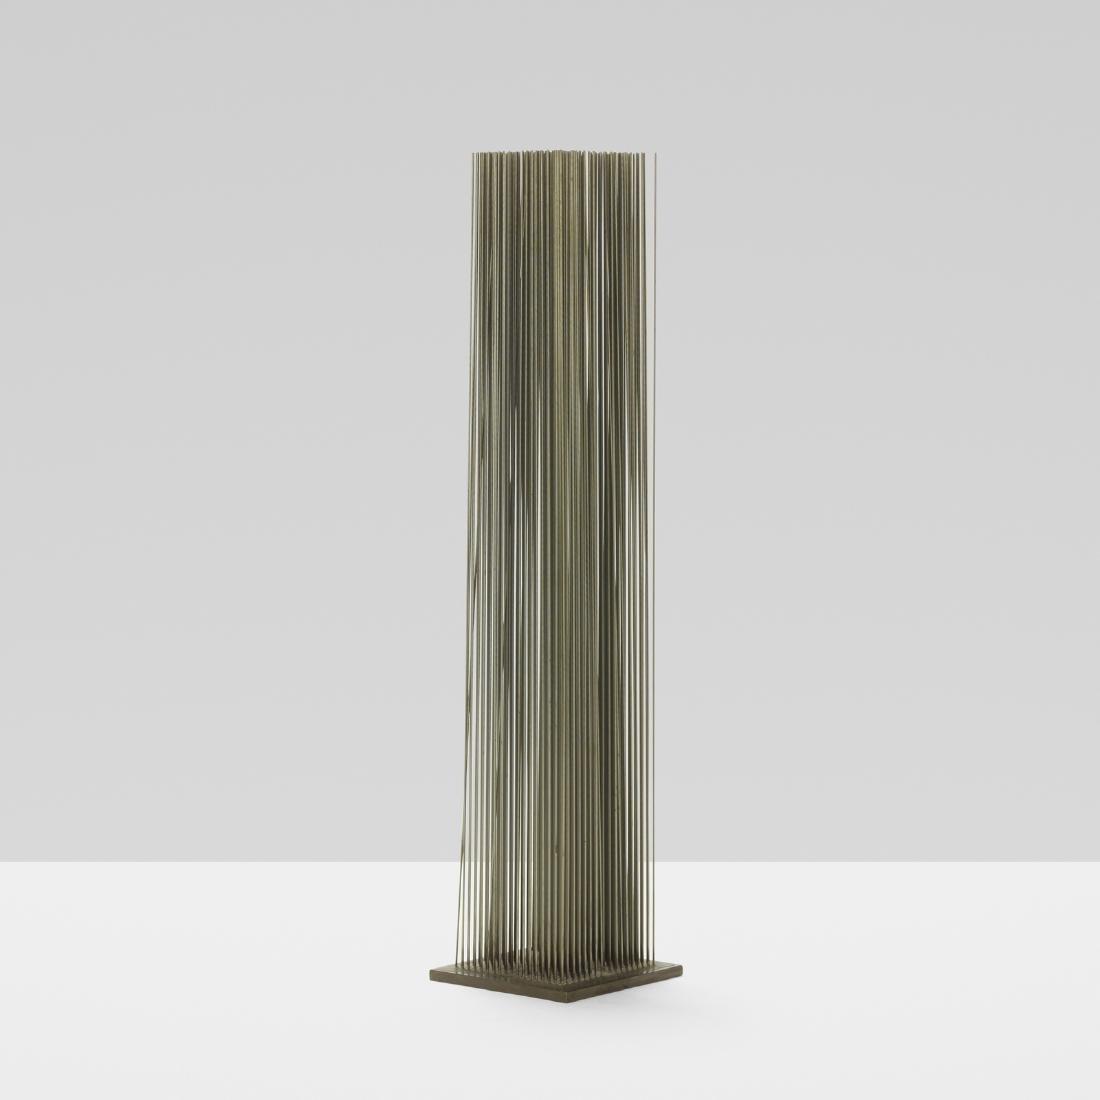 Harry Bertoia, Untitled (Sonambient)